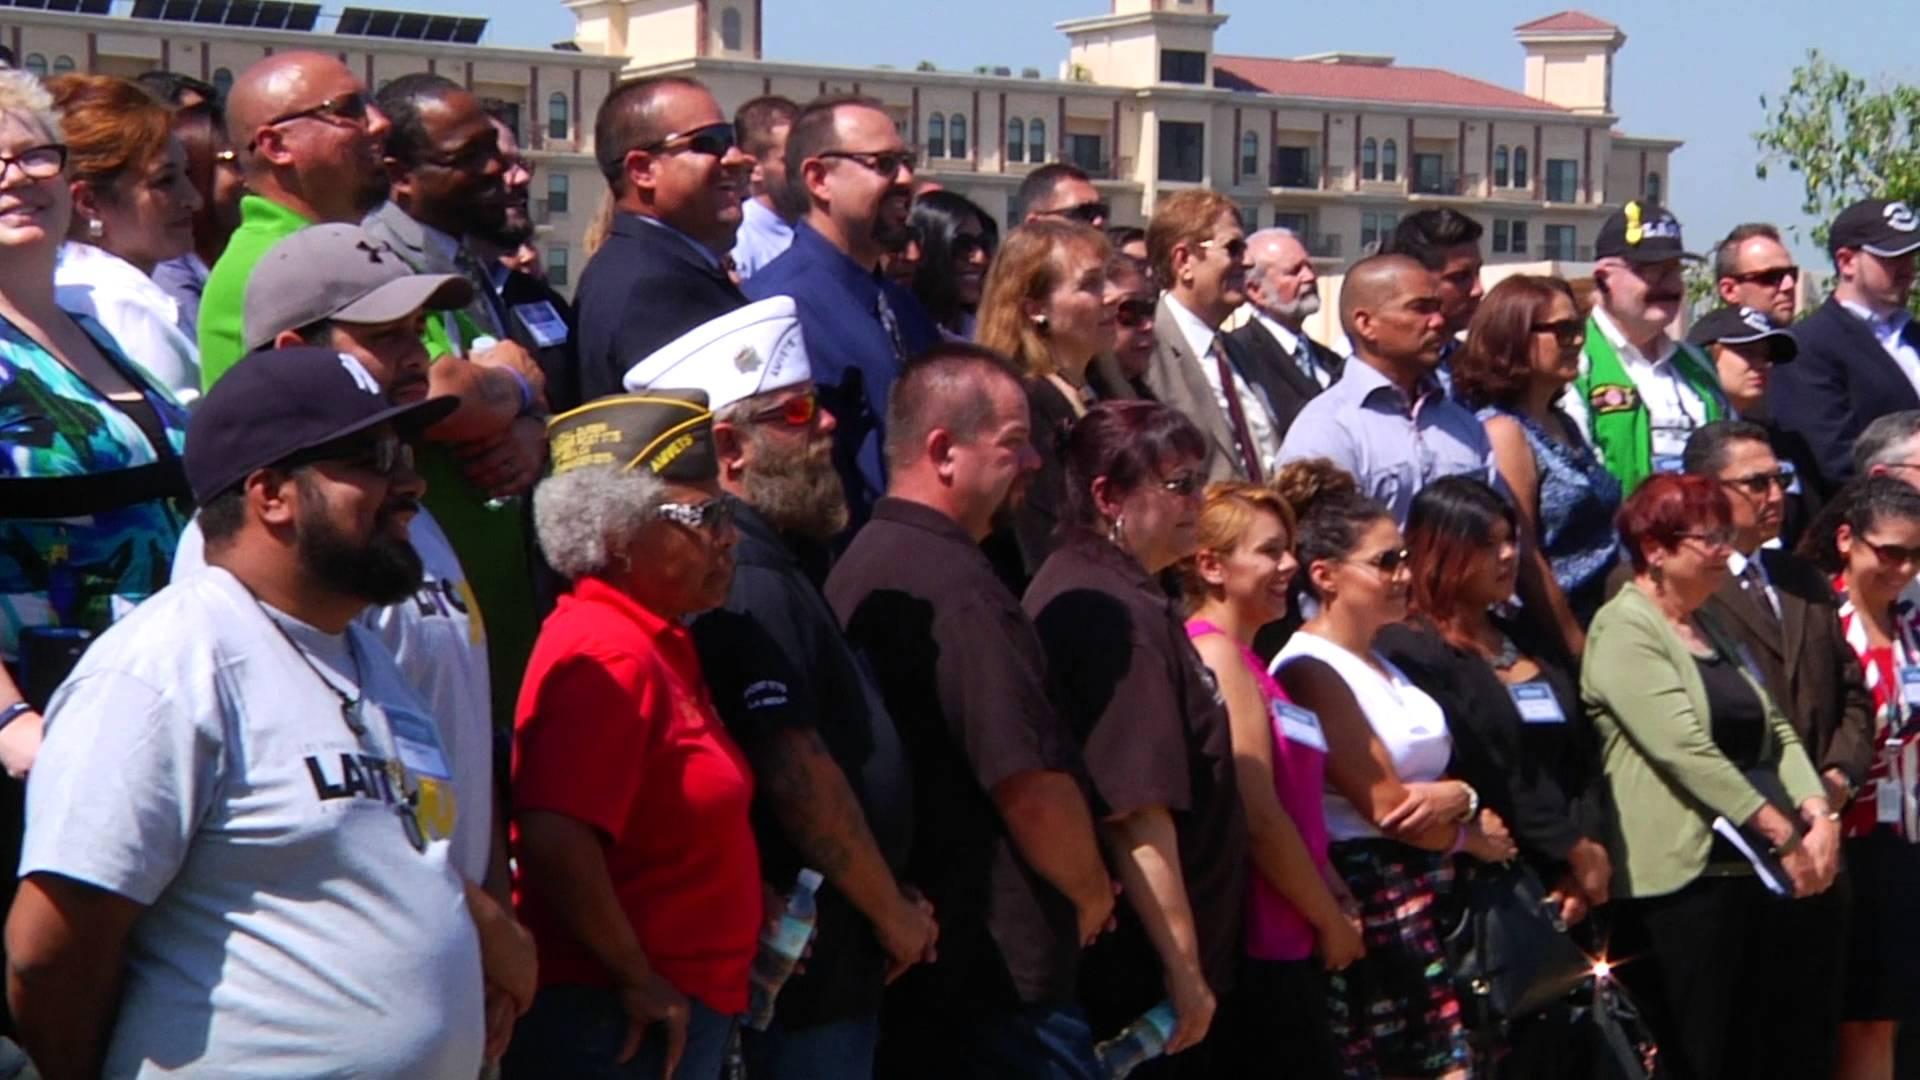 NYFA Military Veterans Team up with LA Mayor Garcetti Through 10,000 Strong Initiative